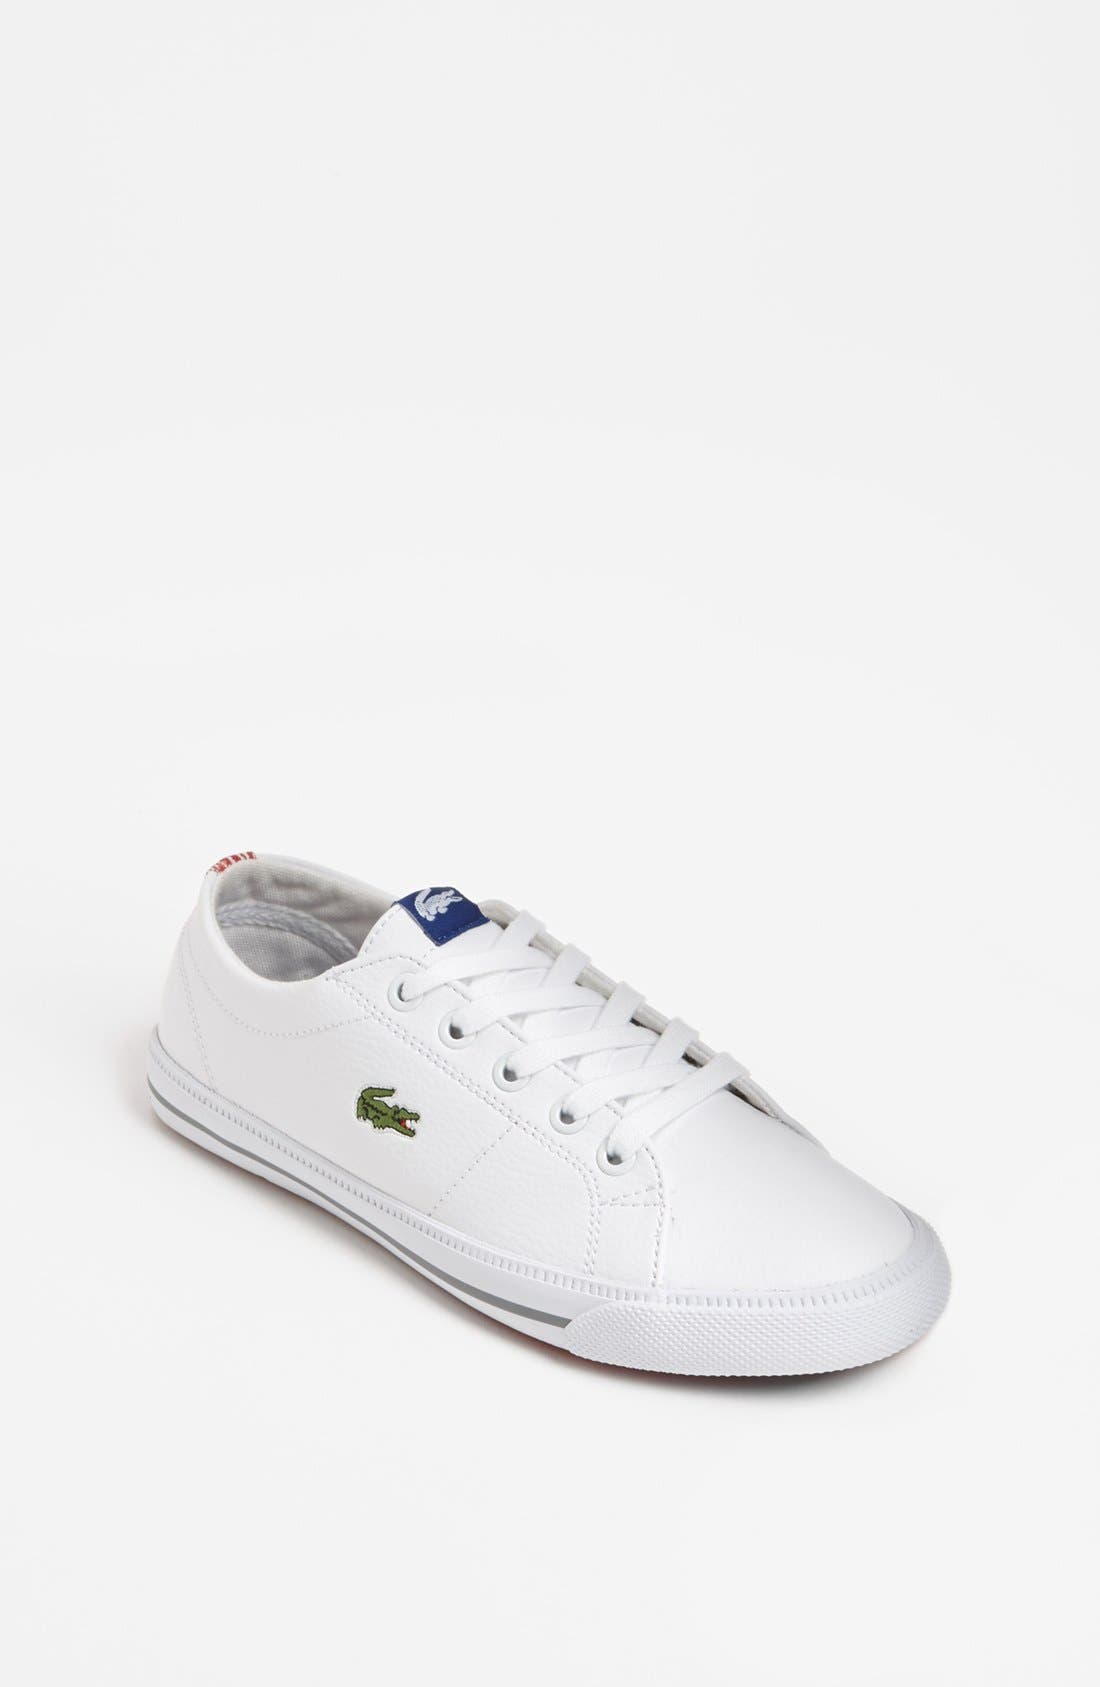 Alternate Image 1 Selected - Lacoste 'Marcel' Sneaker (Toddler & Little Kid)